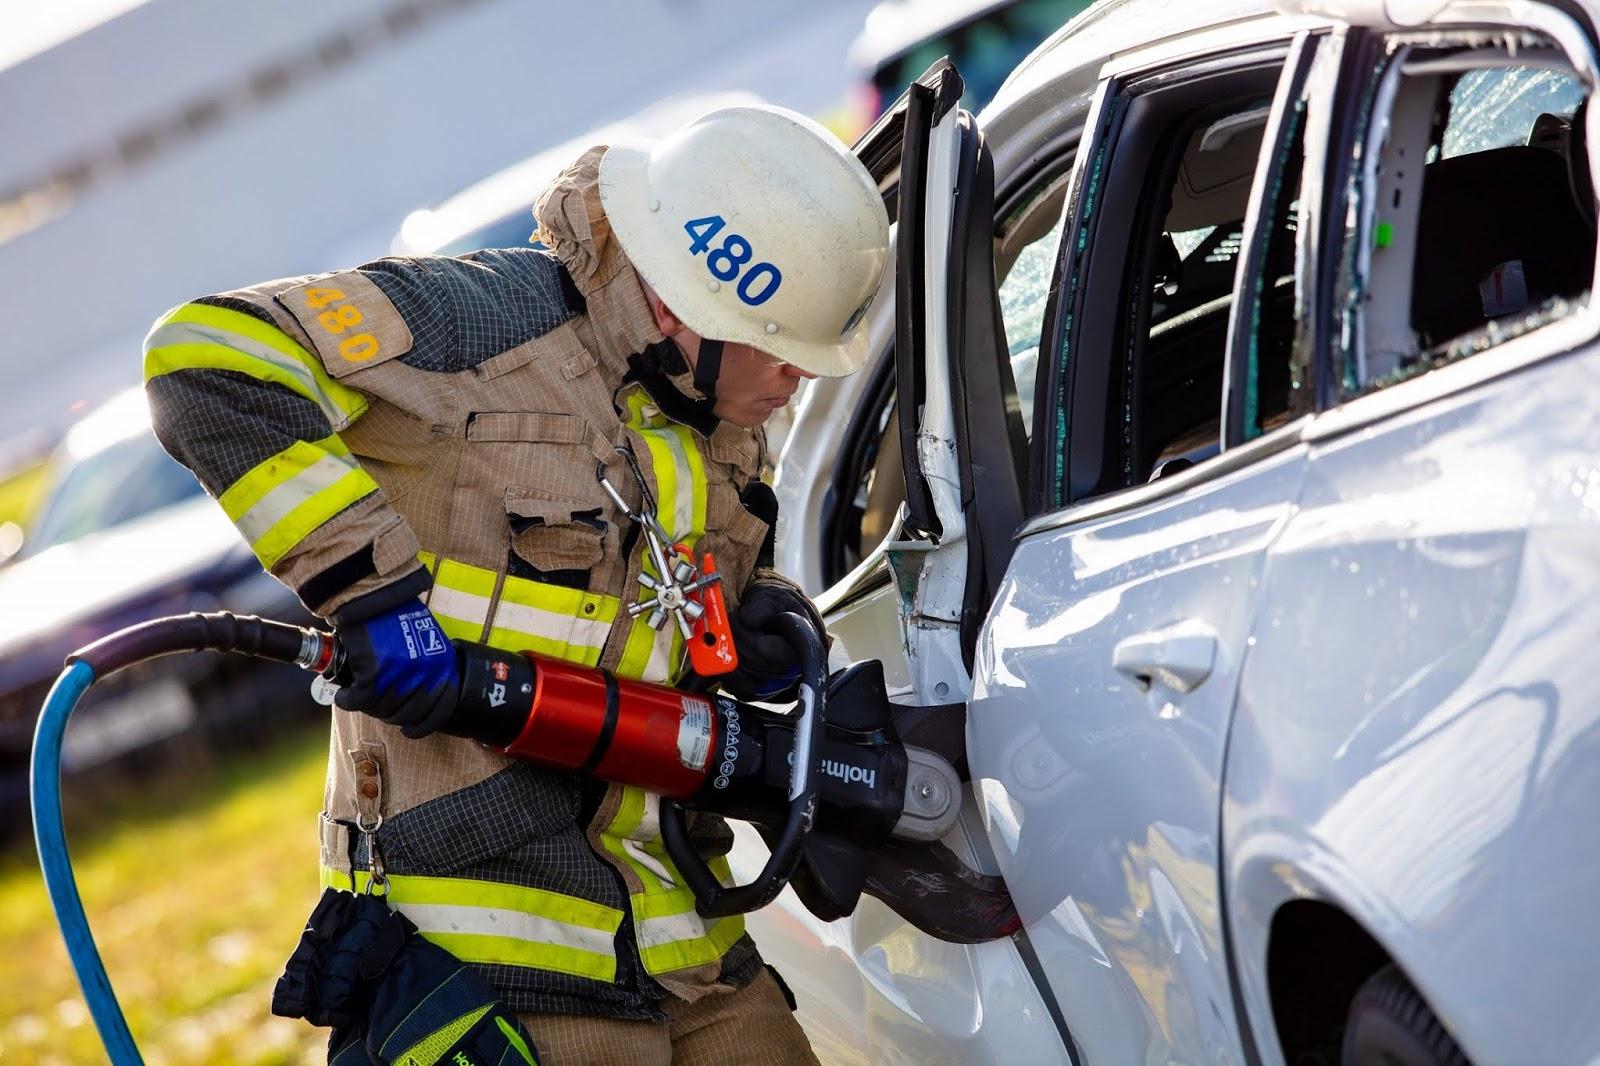 274401 Volvo Cars drops new cars from 30 metres to help rescue services save H Volvo πετάει τα μοντέλα της από ύψος 30 μέτρων για crash test! crash, crash tests, video, videos, Volvo, βίντεο